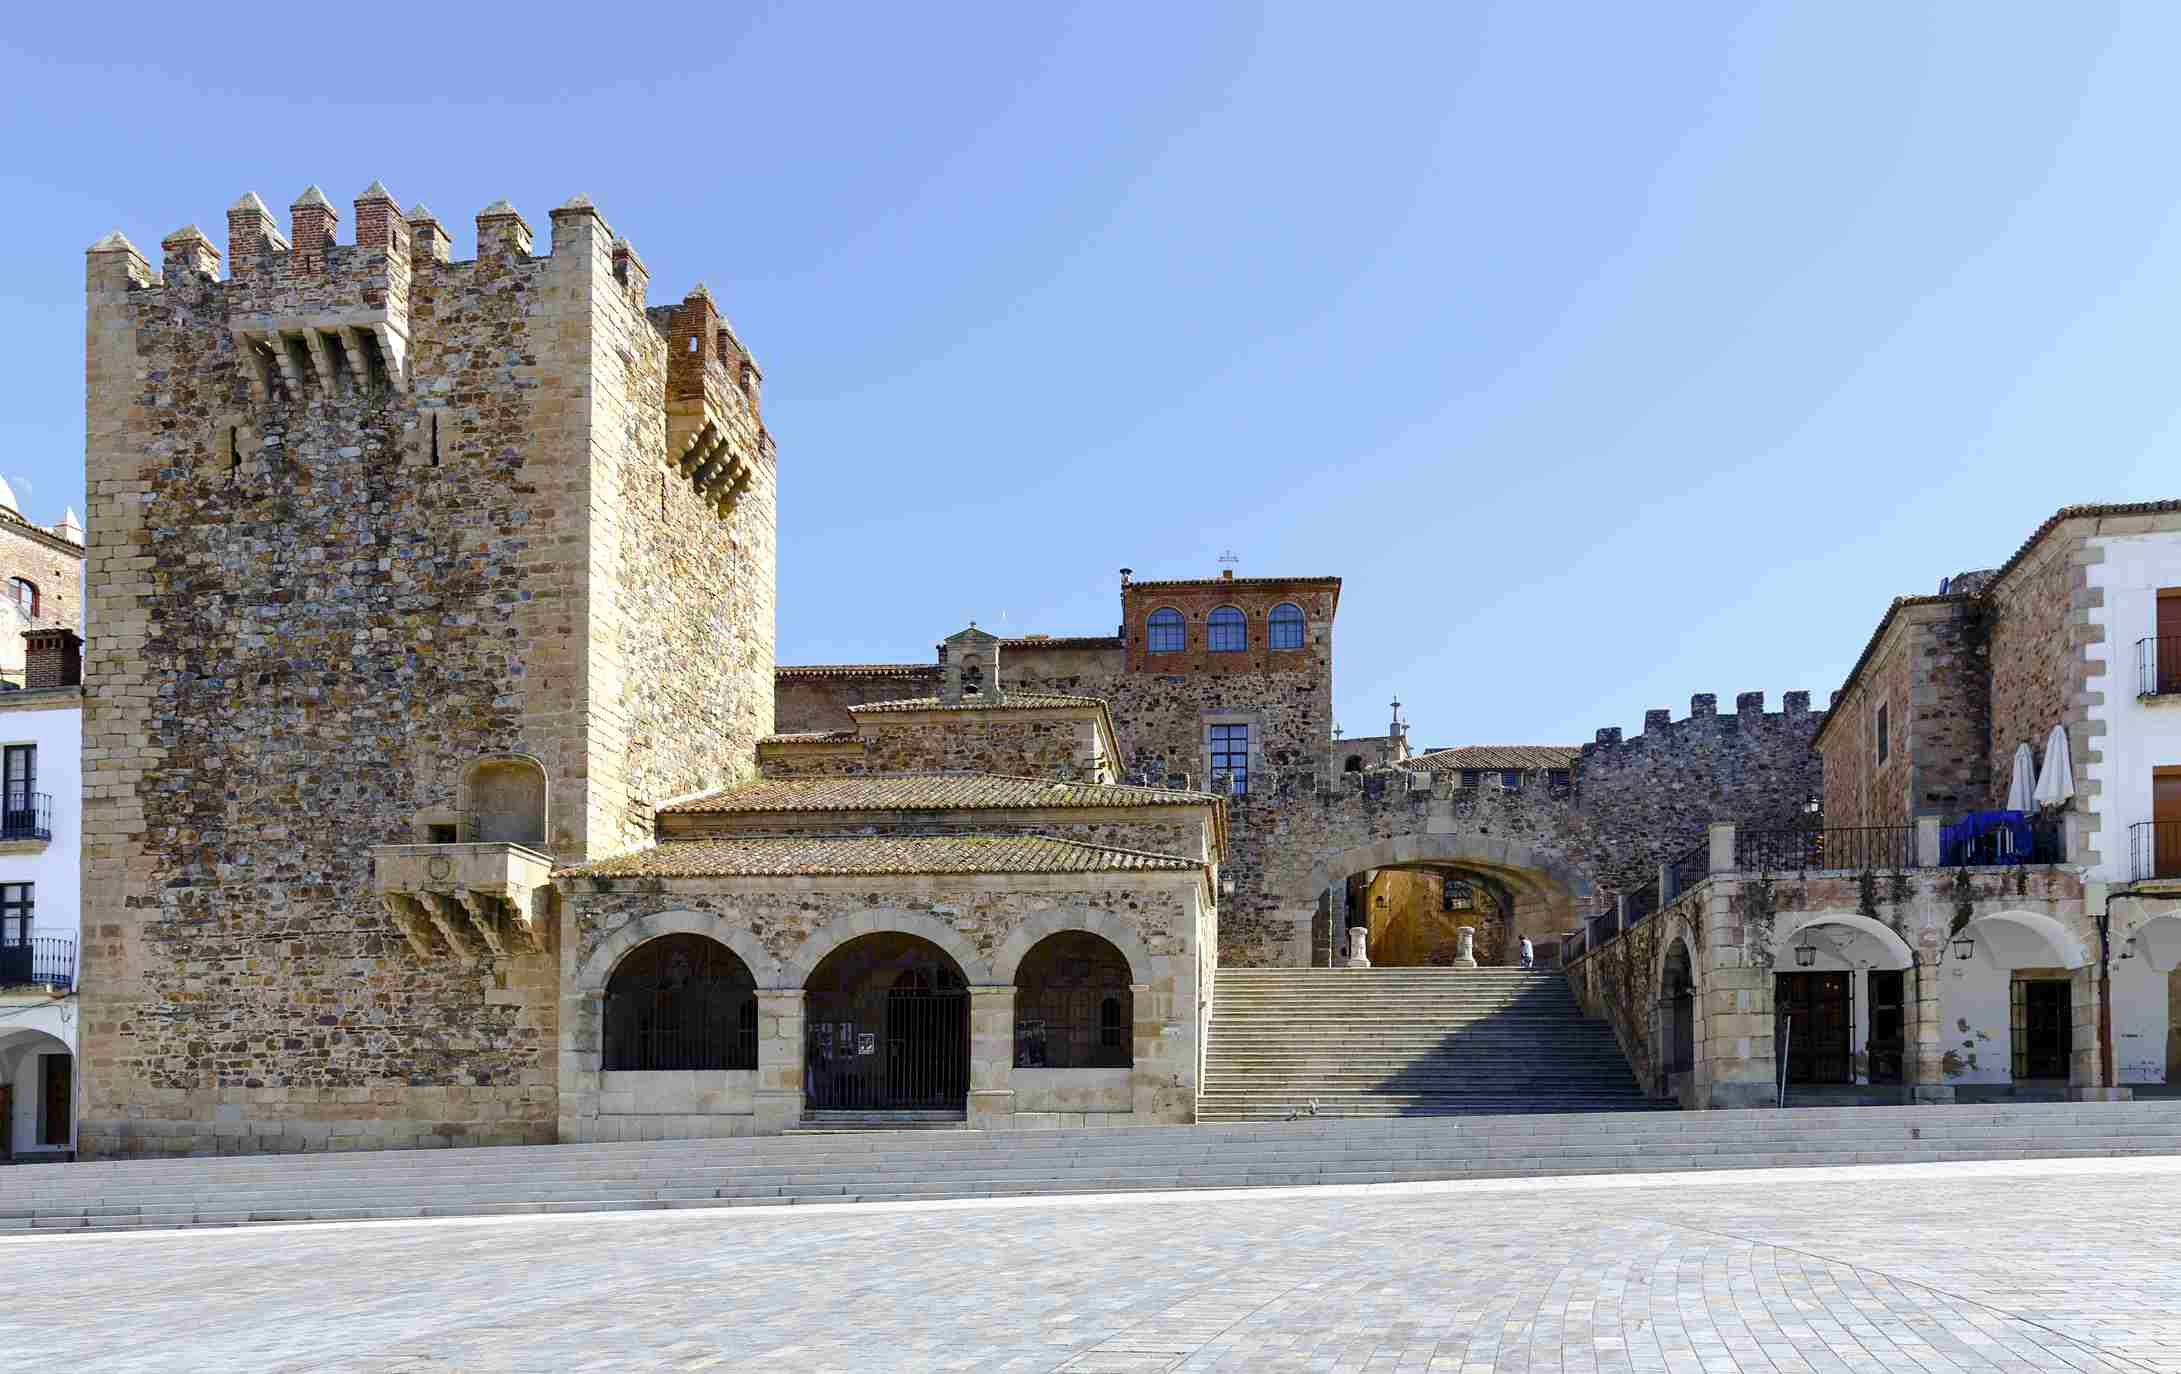 Caceres Extremadura Spain. Bujaco Tower